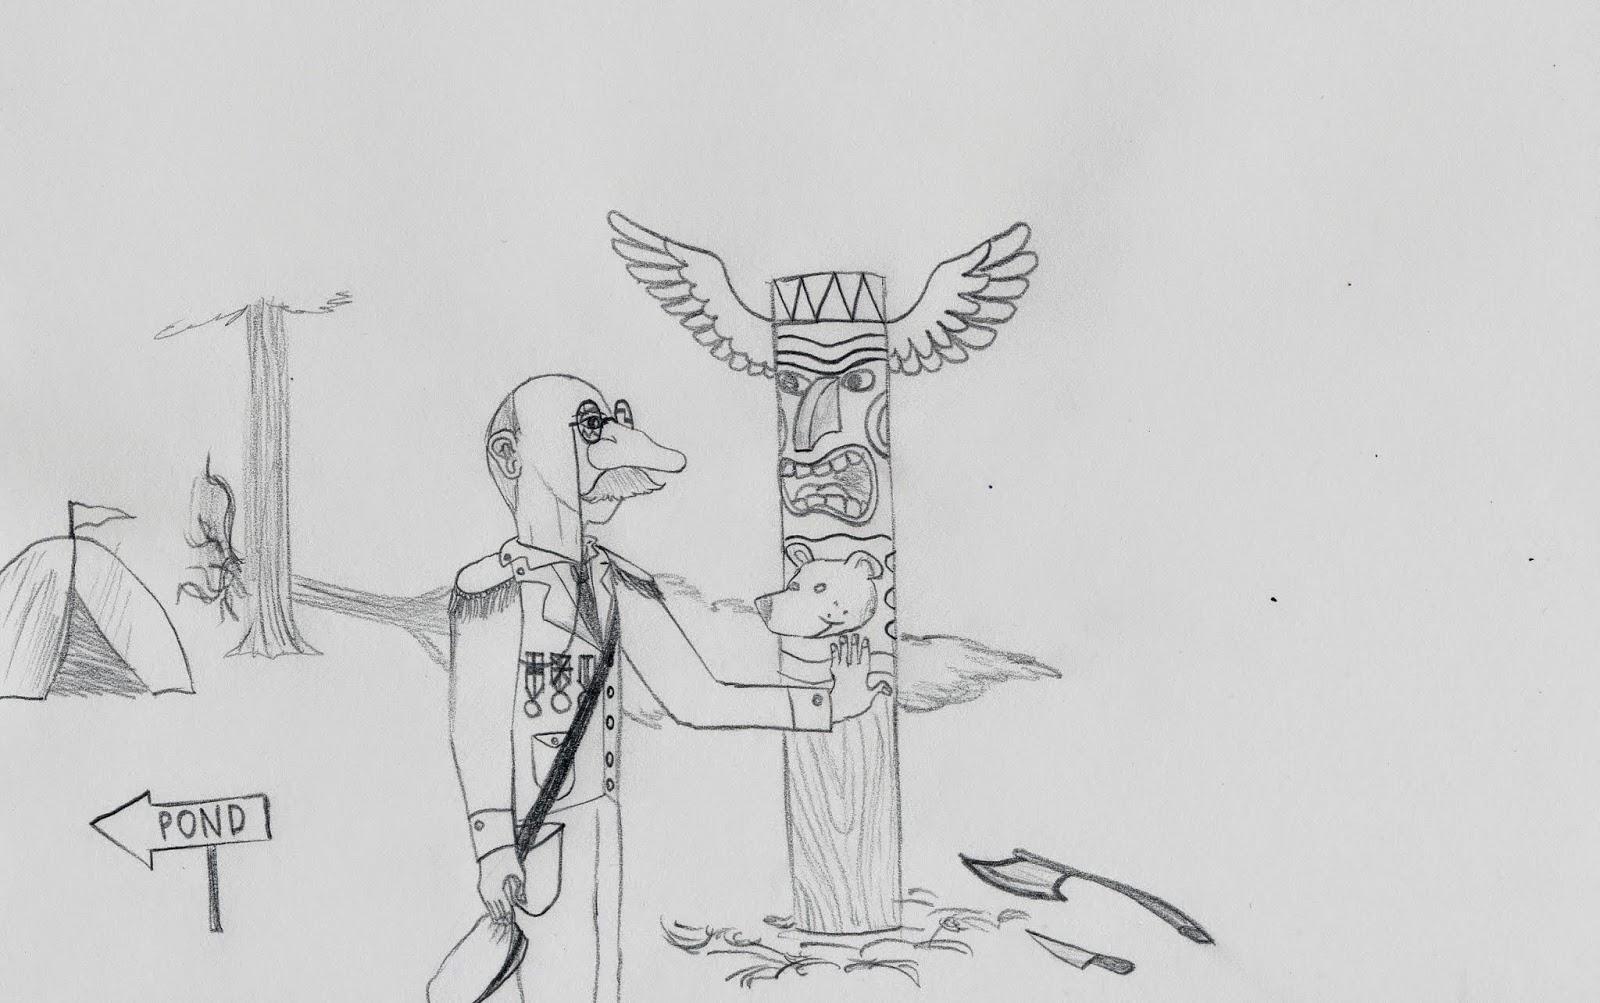 Santiago: Evolution of an artist: Spring 2014 Drawings